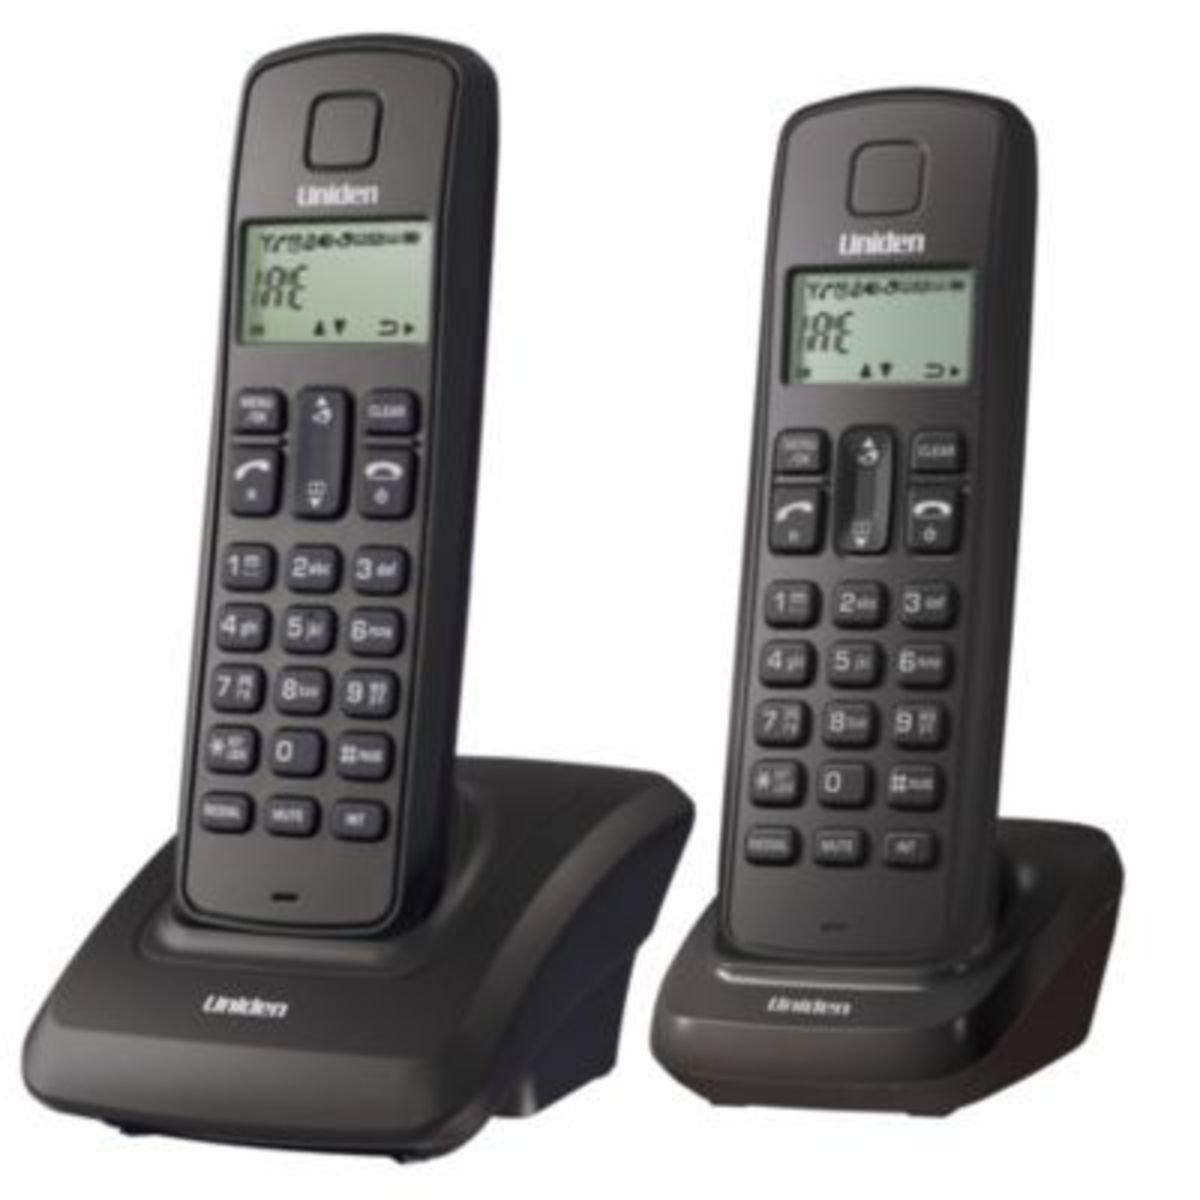 Uniden日本1.8 GHz數碼子母無線電話, Reveal 1260-2